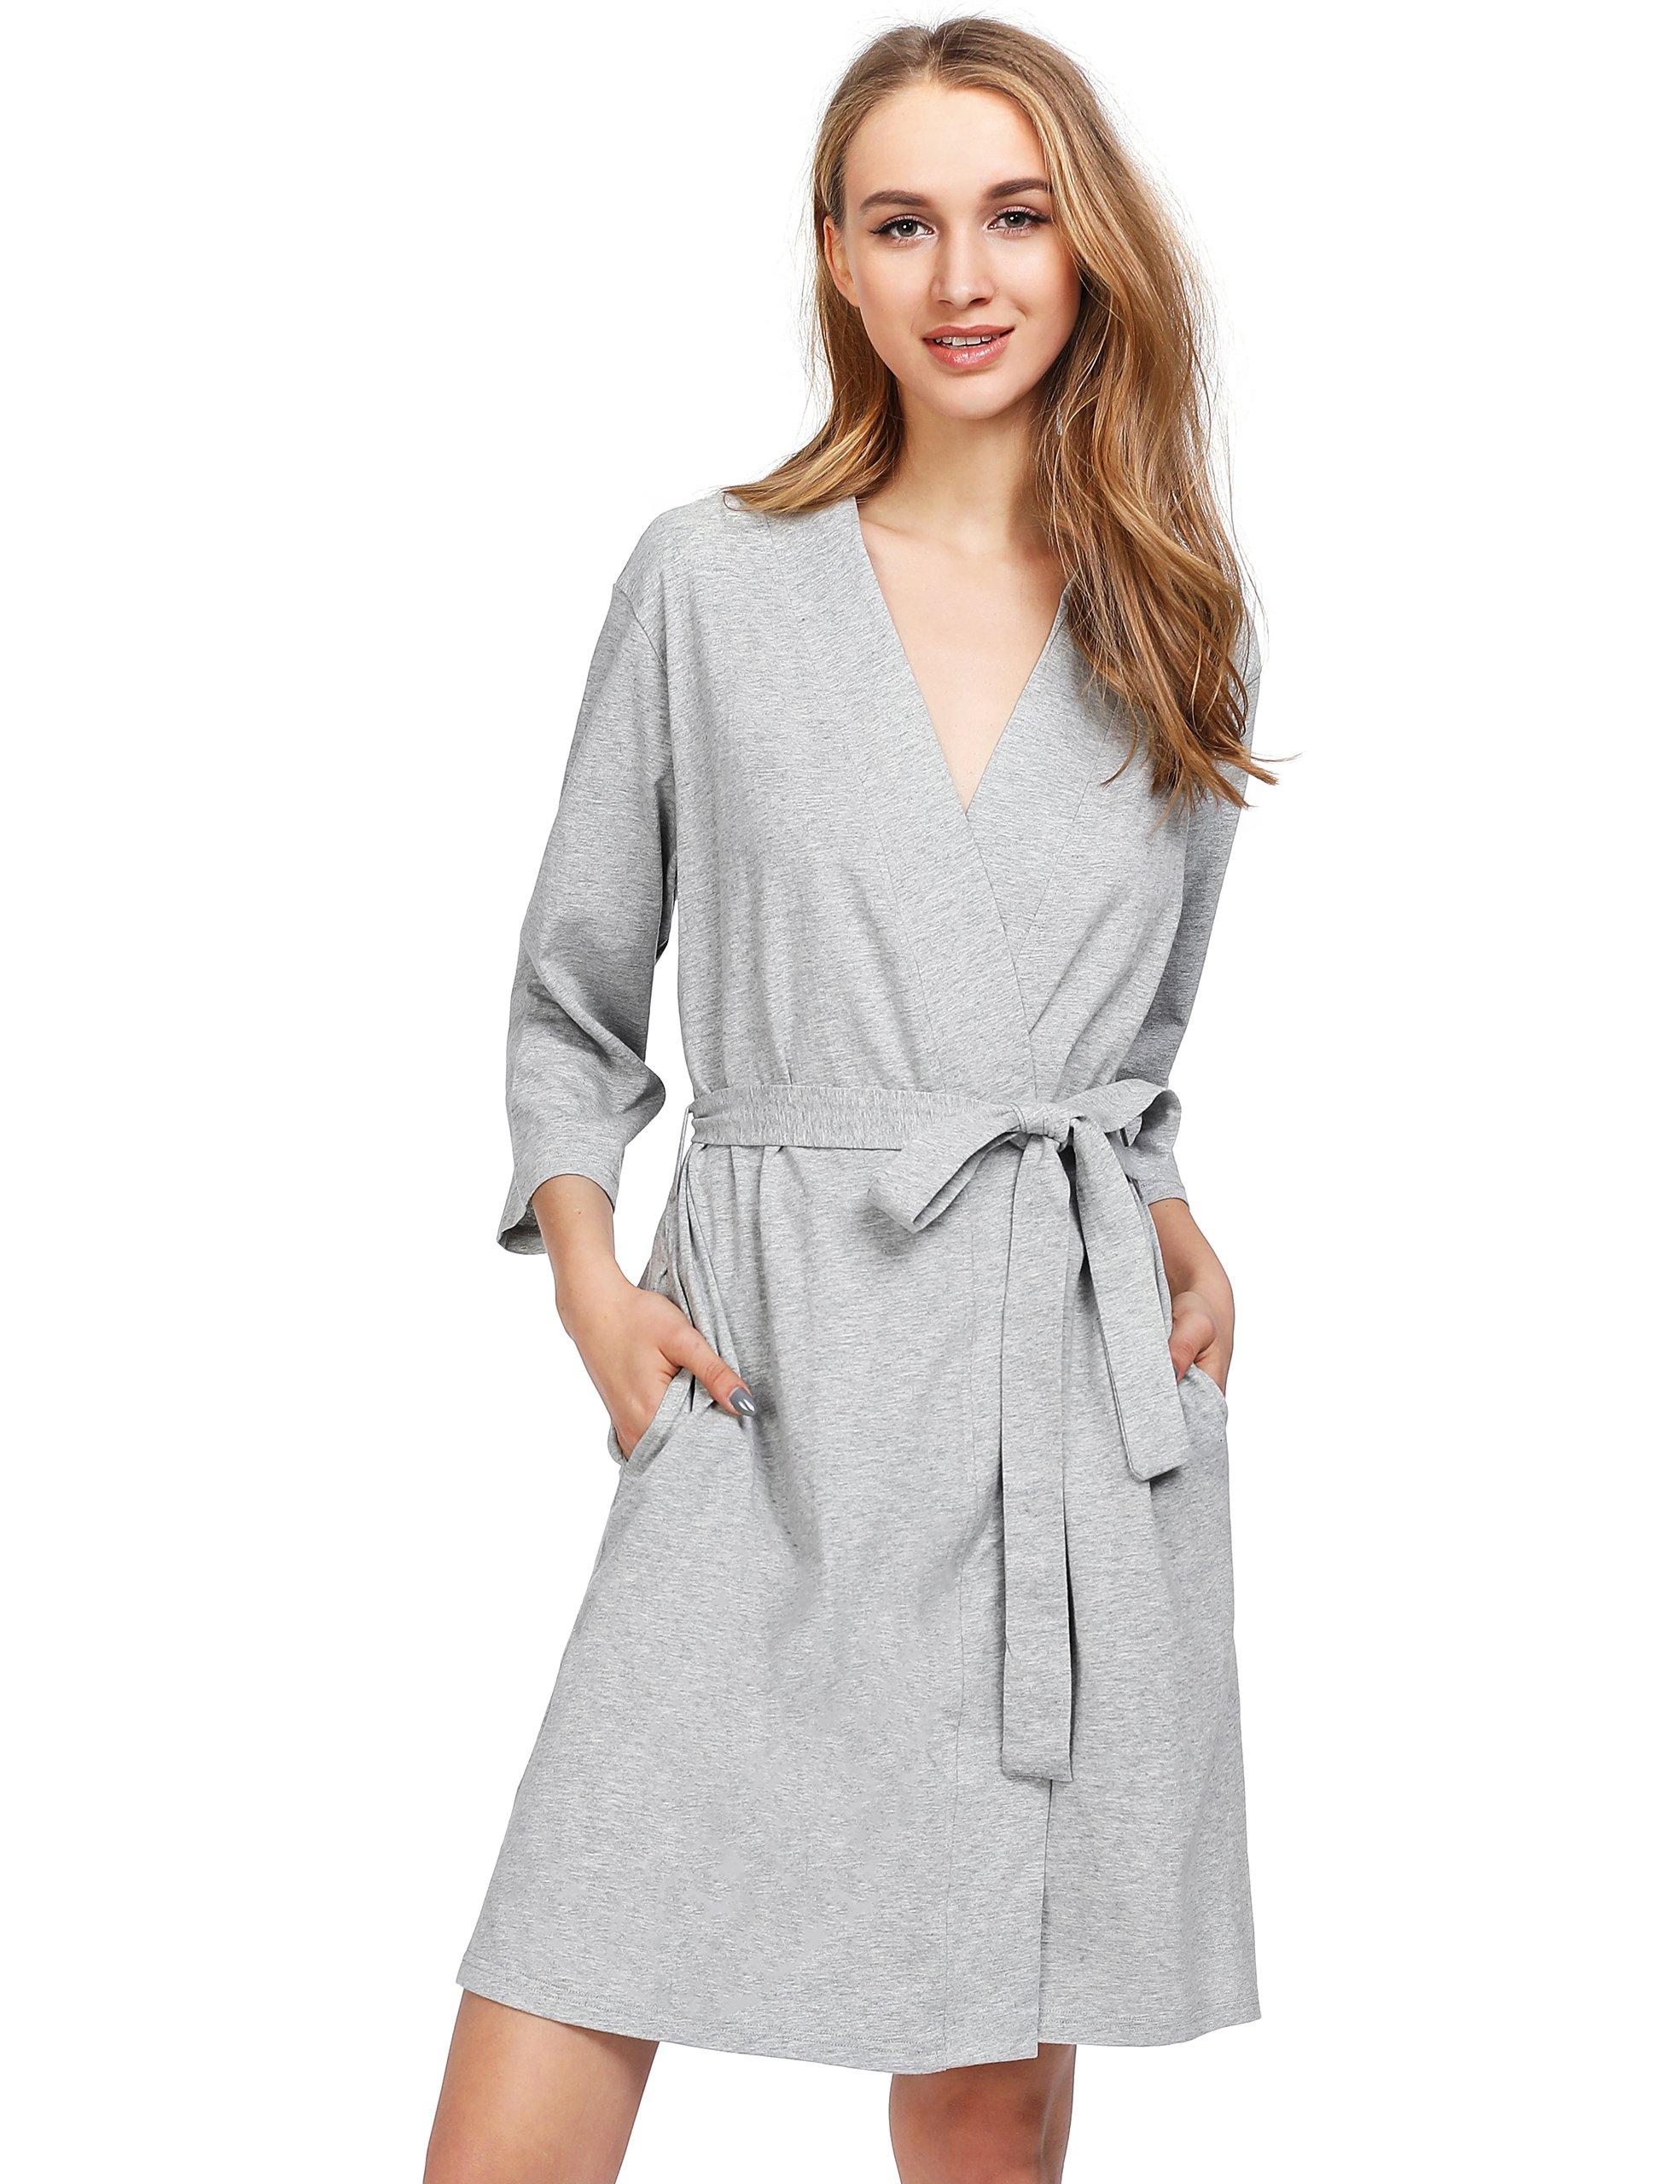 Latuza Women's Cotton Robe 2X Light Gray